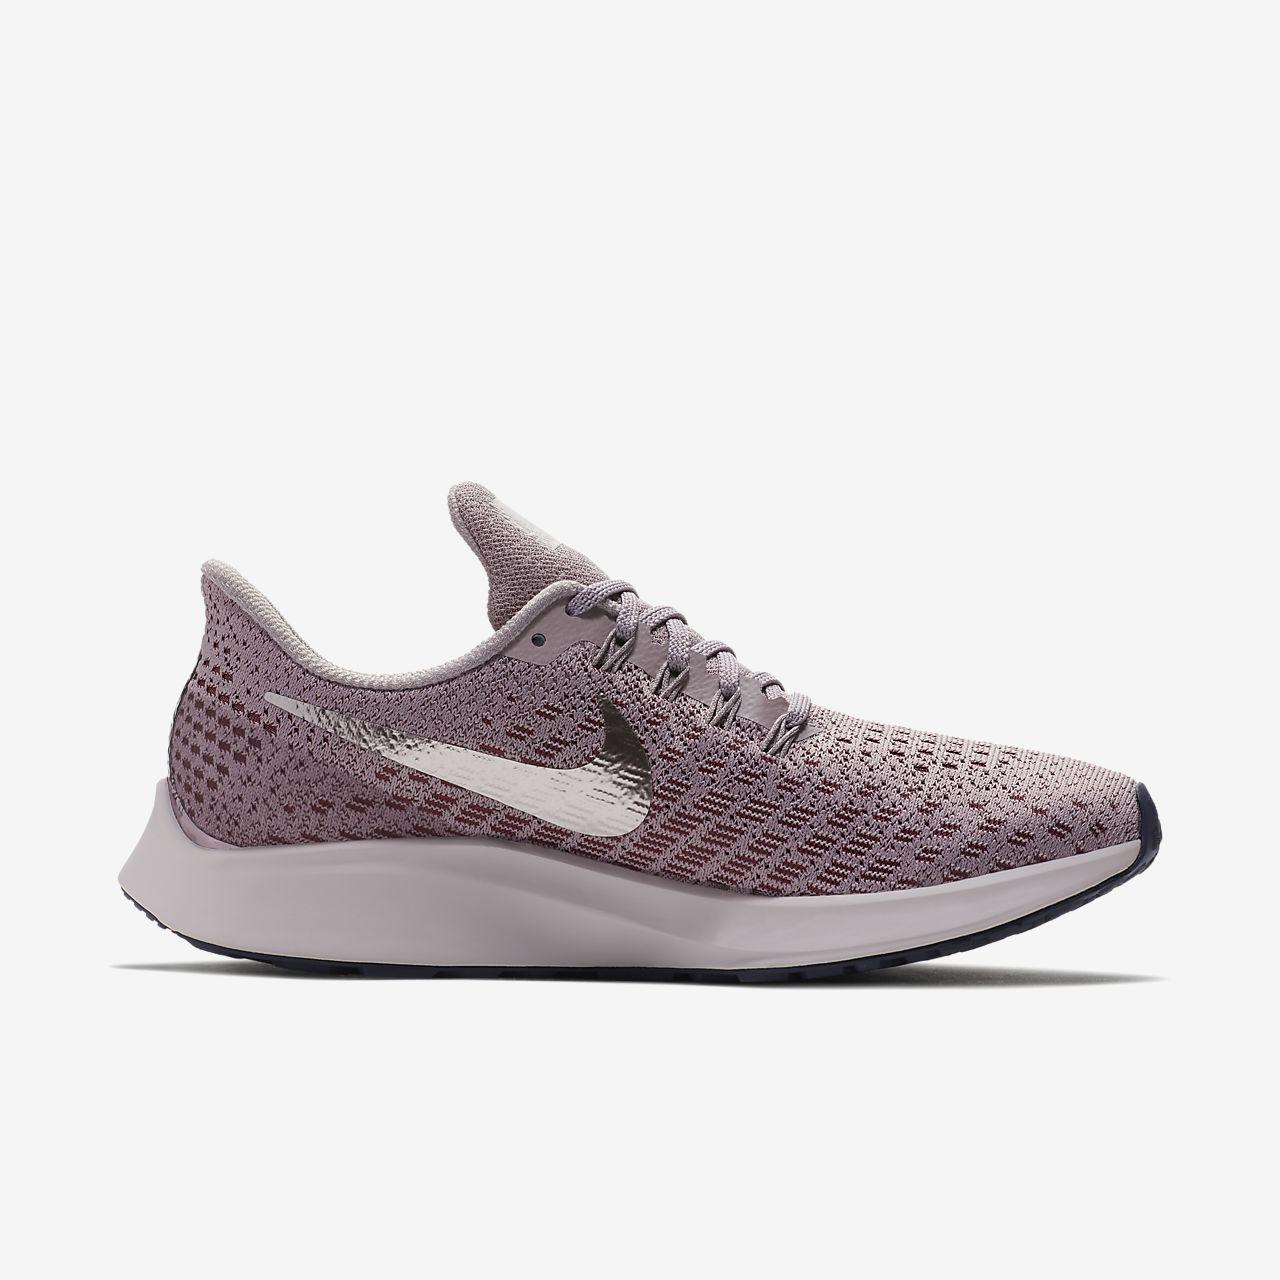 Nike Air Zoom Pegasus 35 Damen-Laufschuh - Pink 9KjKq0npMe